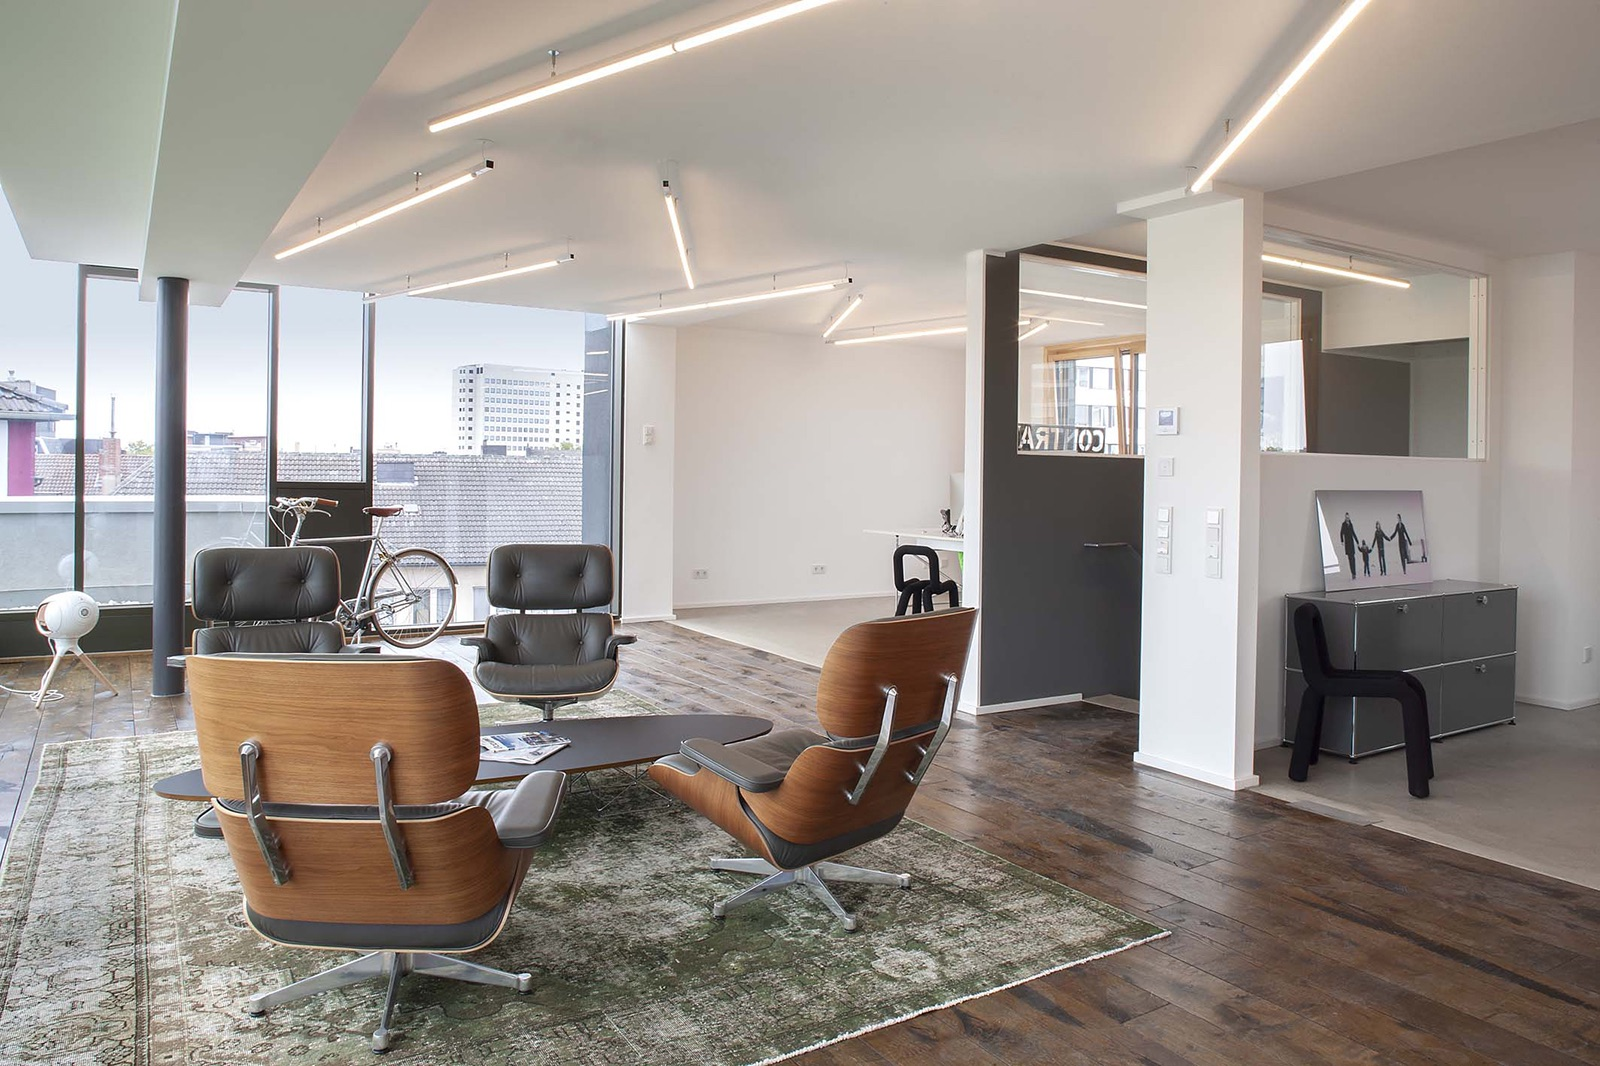 contra-bochum-office-3